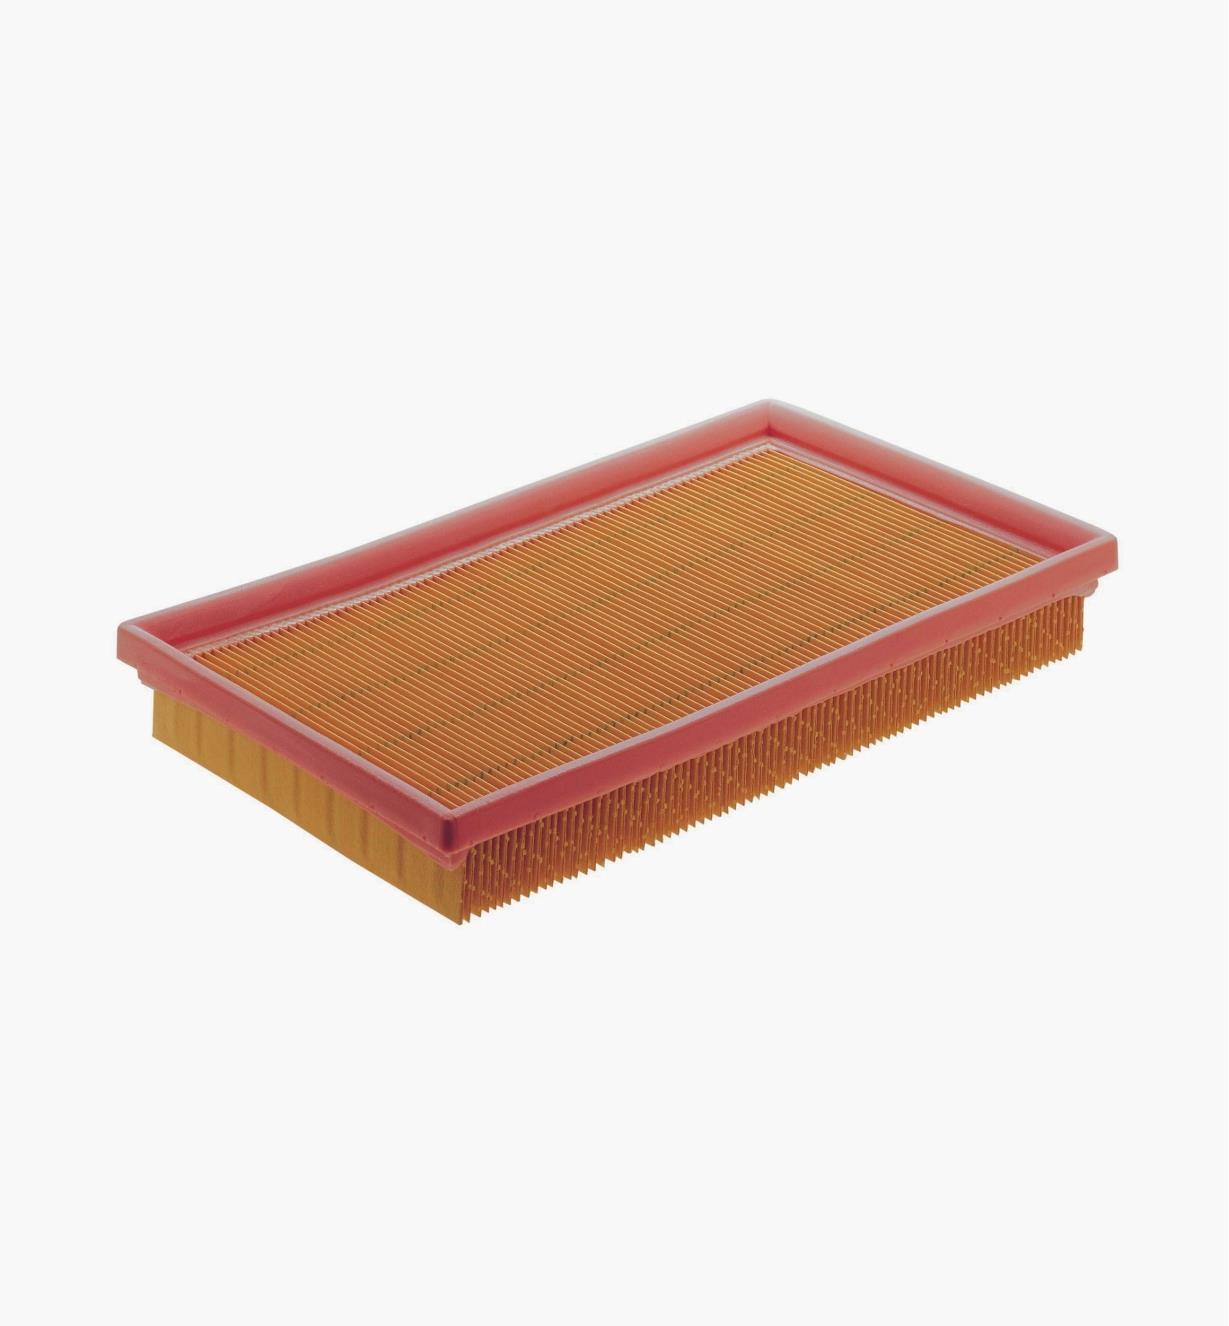 ZA456790 - Main Filter Element (CT MINI, CT MIDI)